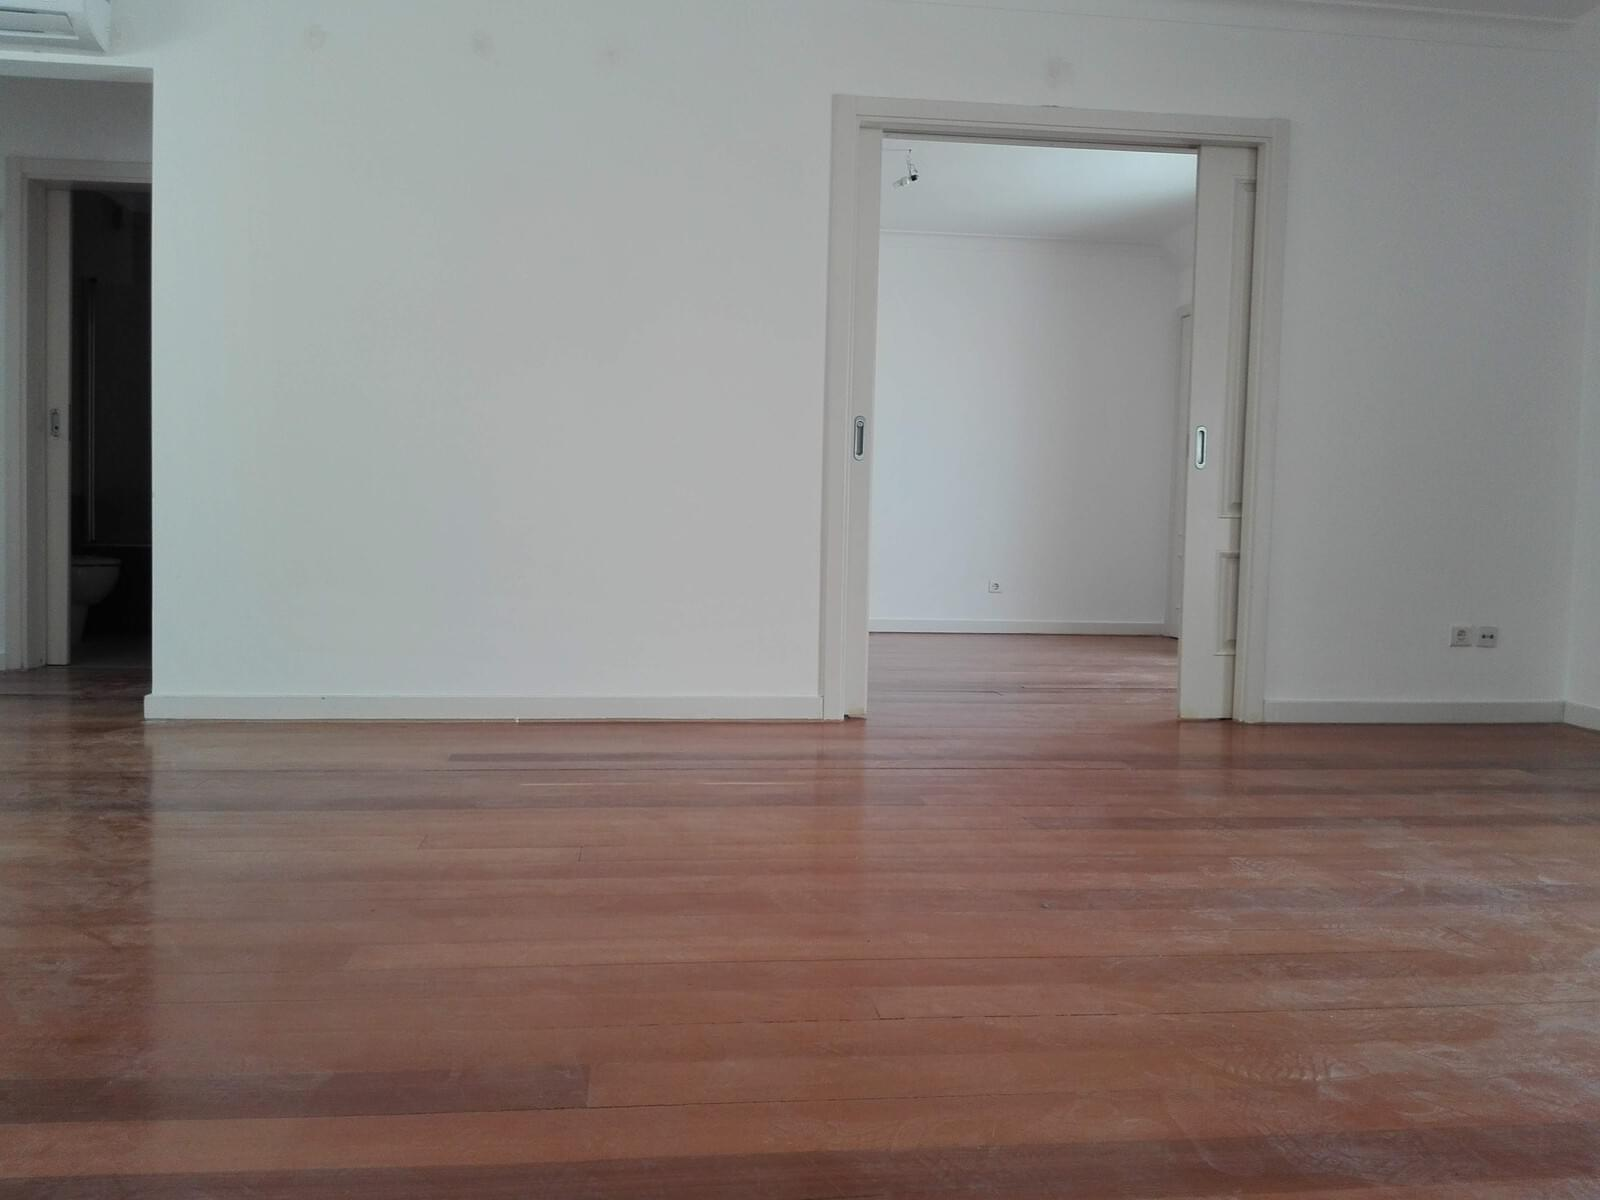 pf17908-apartamento-t1-lisboa-7993e32b-09e1-4c50-9863-e664a445f730